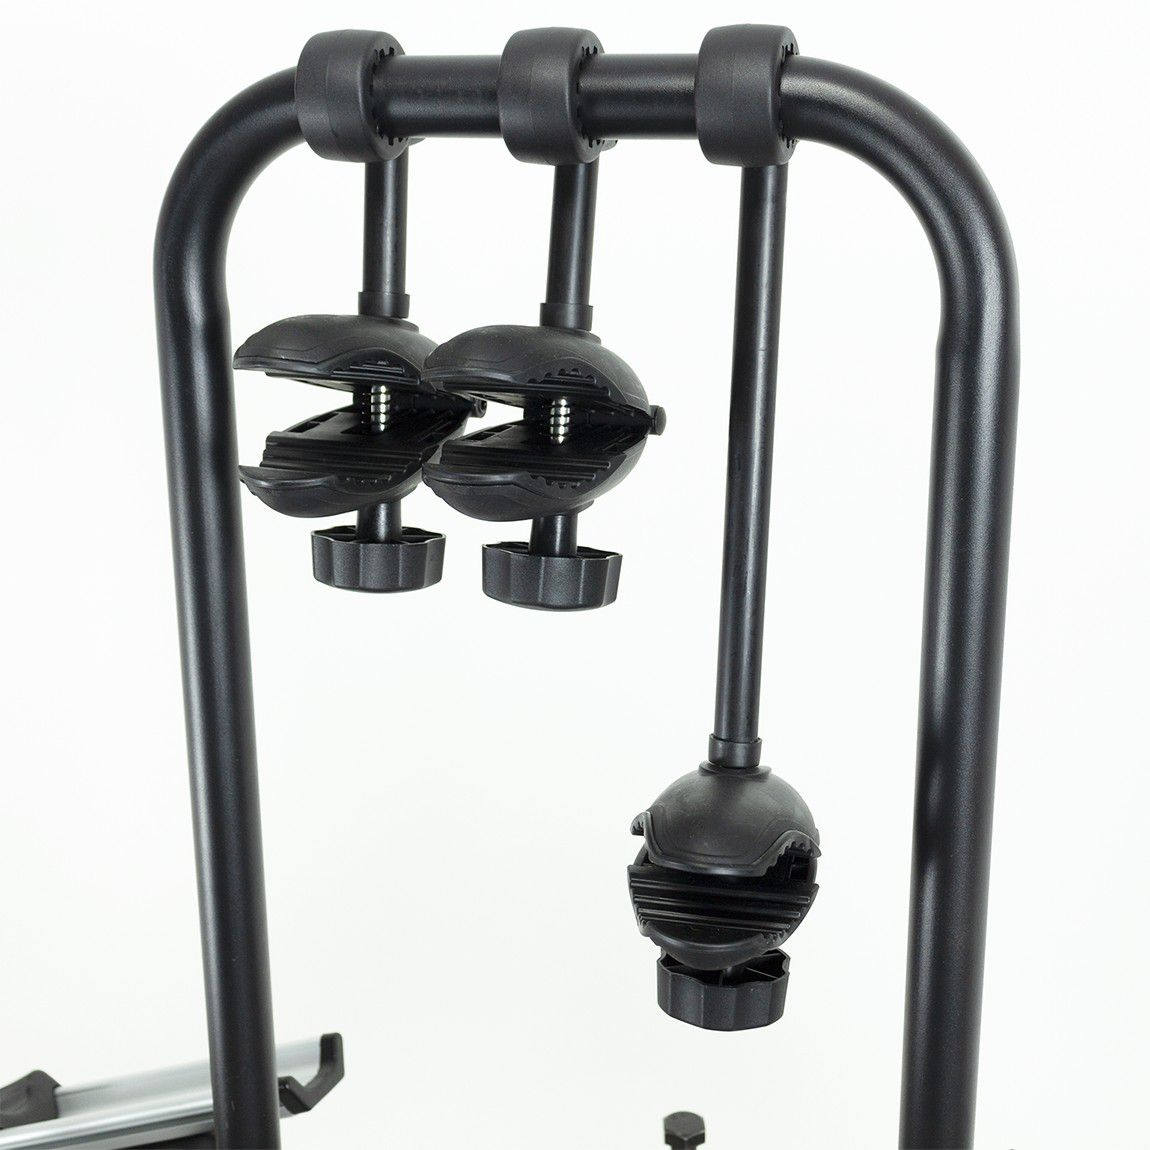 Transbike Reboque Tsw Aero 3 P/ Engate 3 Bikes Inclinável